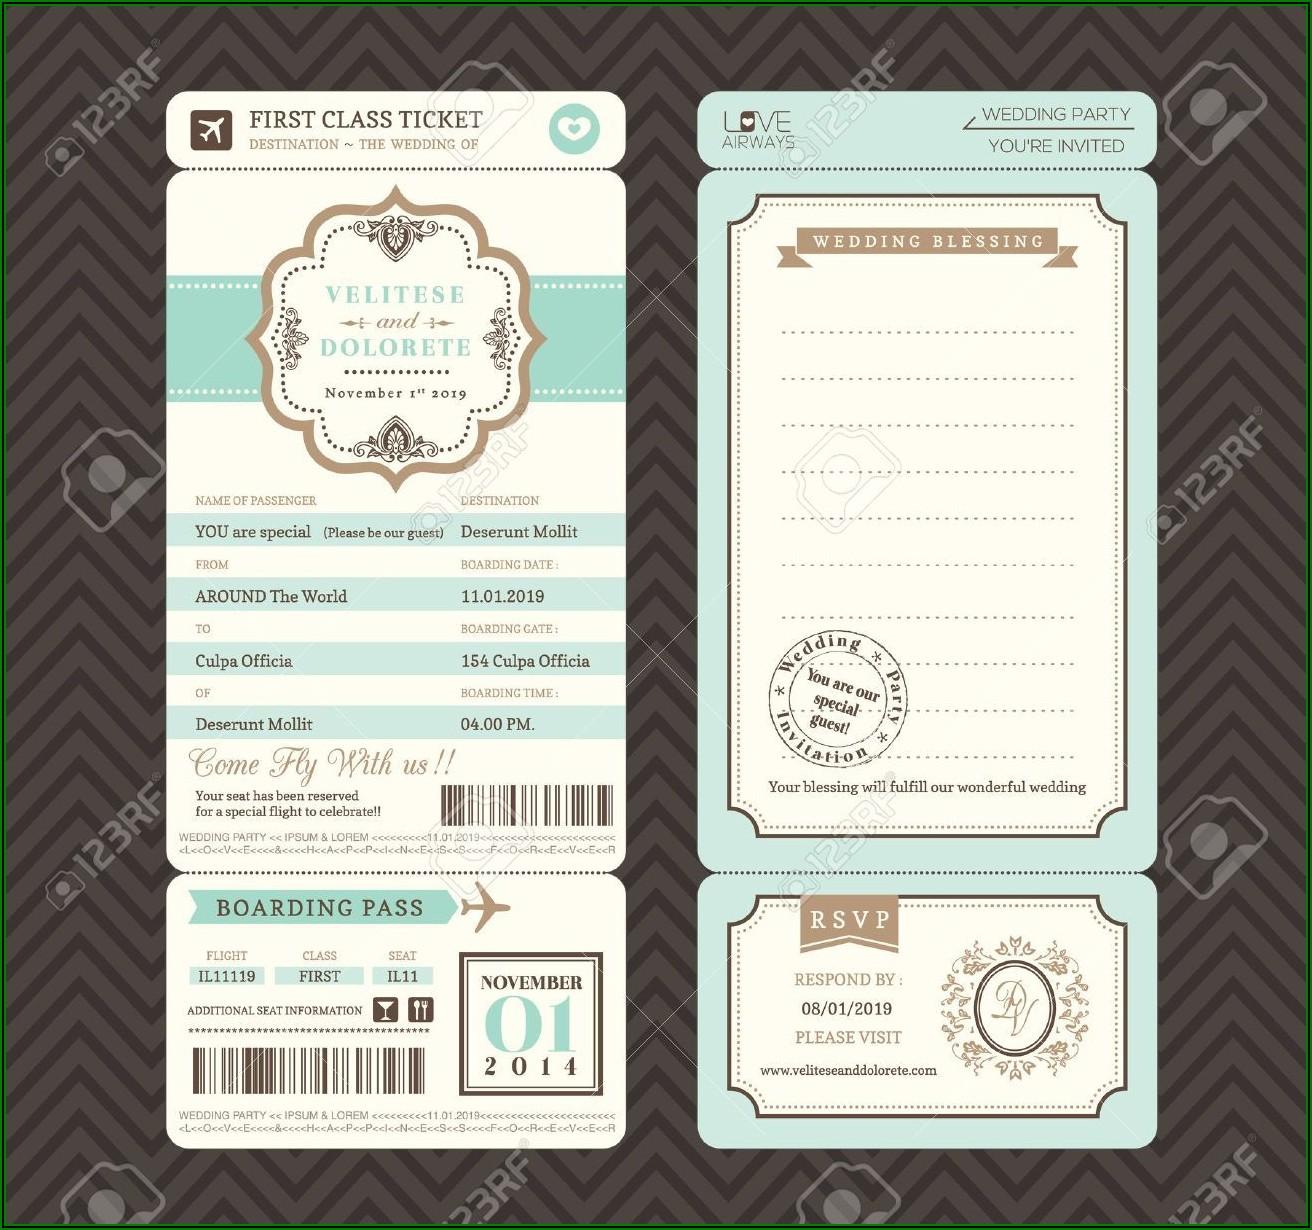 Boarding Pass Style Wedding Invitation Template